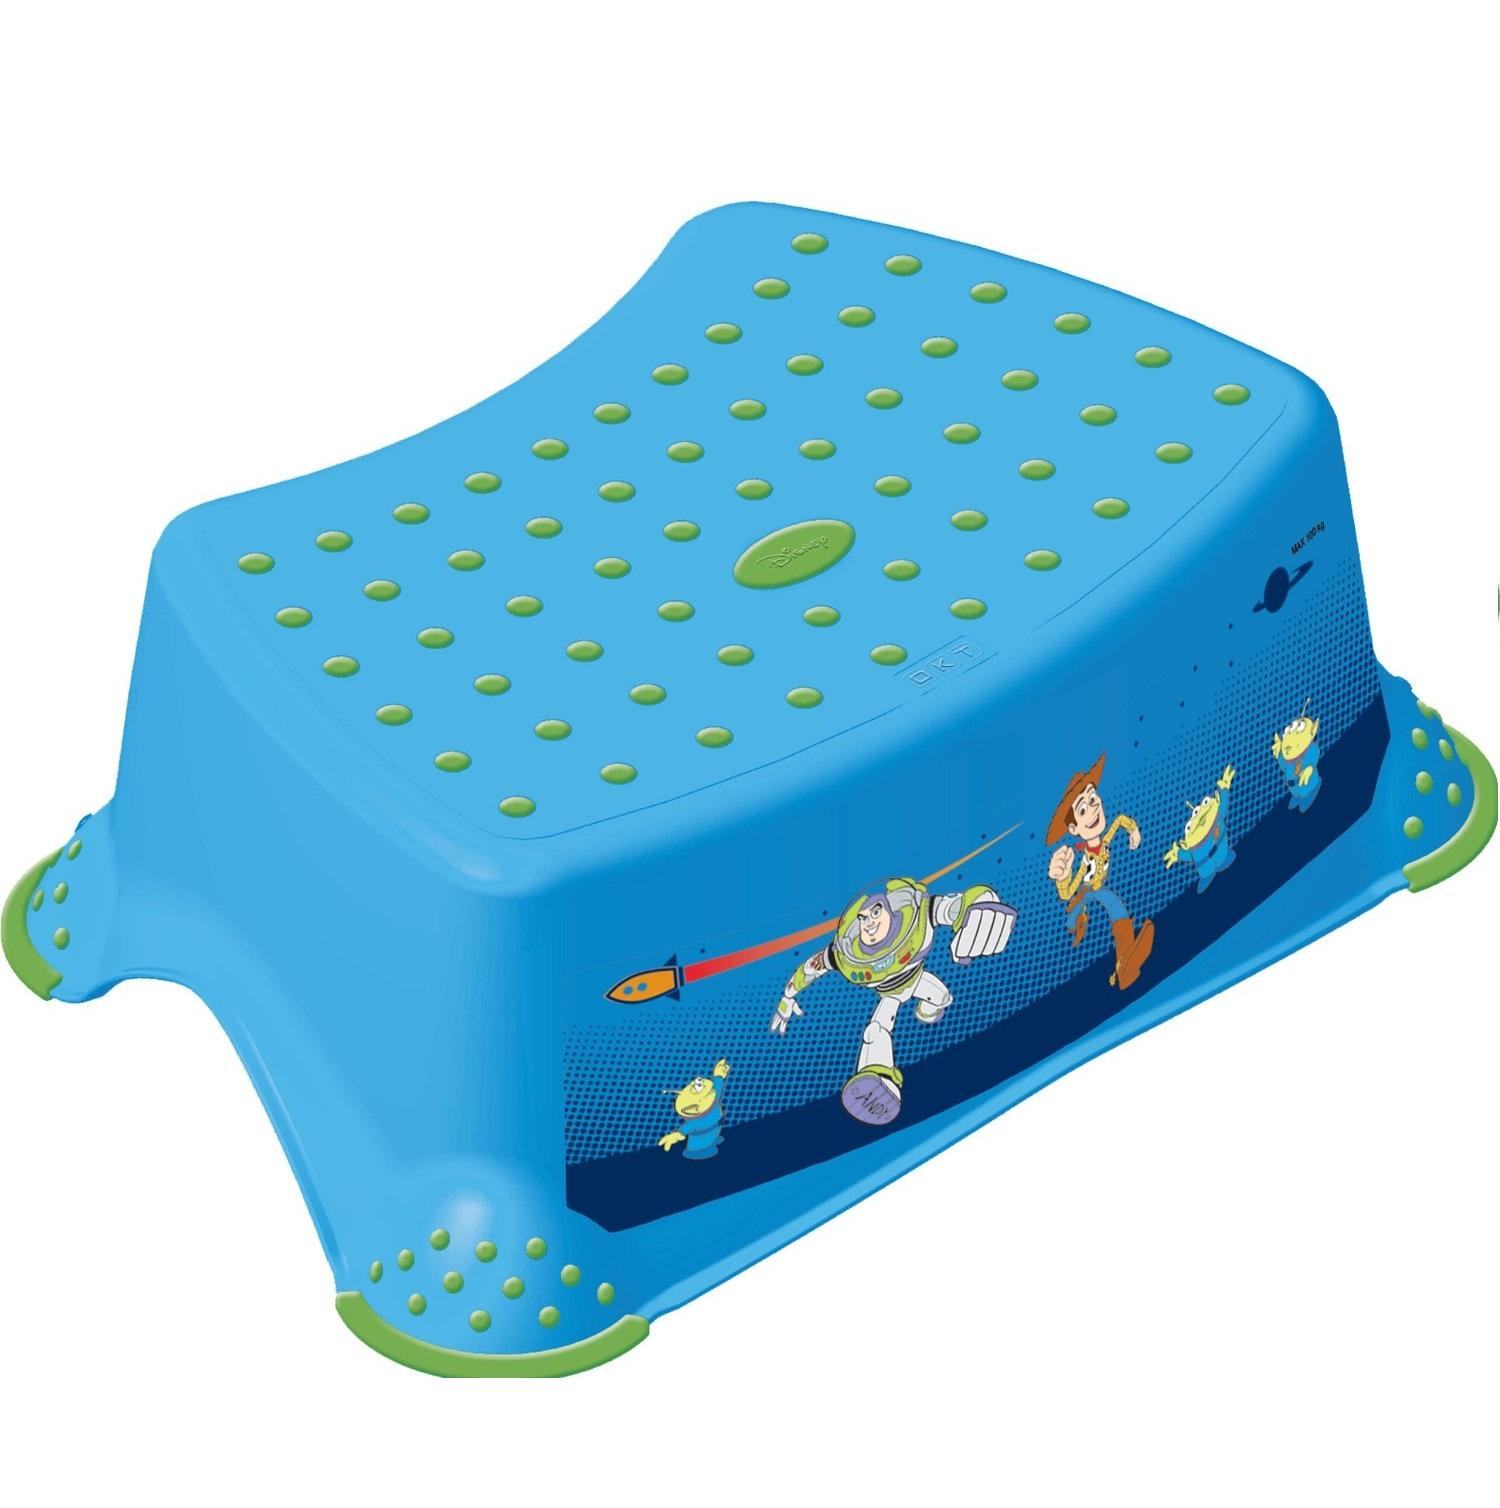 Toy Story Stool : Bargain disney toy story step stool just £ at amazon